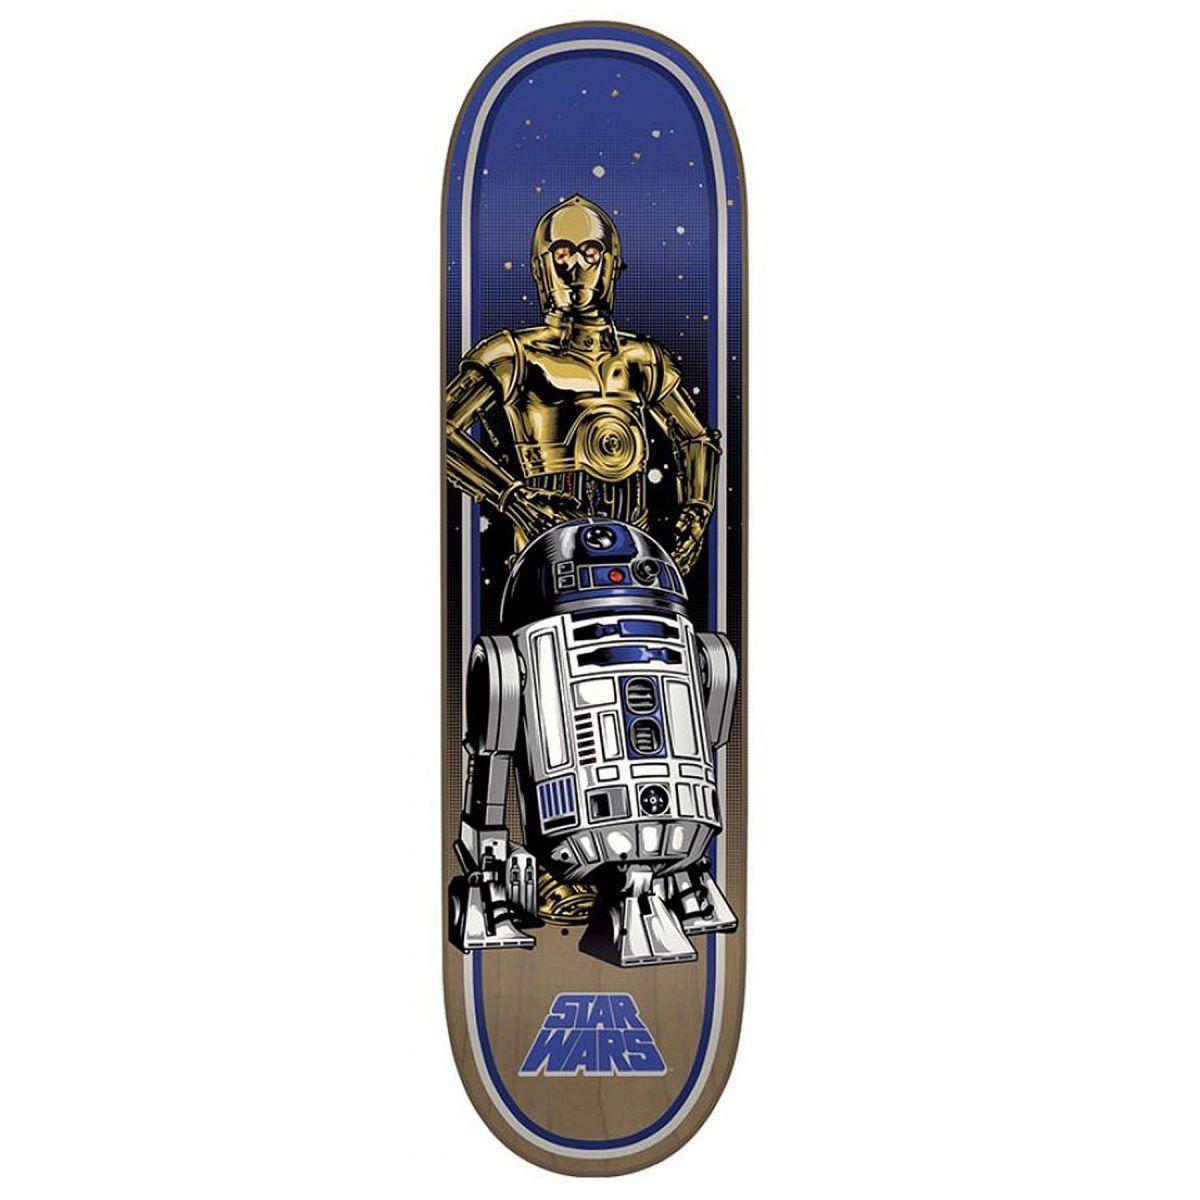 Star Wars Skateboard Deck R2D2 C3PO DROIDS 8.375 in Santa Cruz SHRED ...